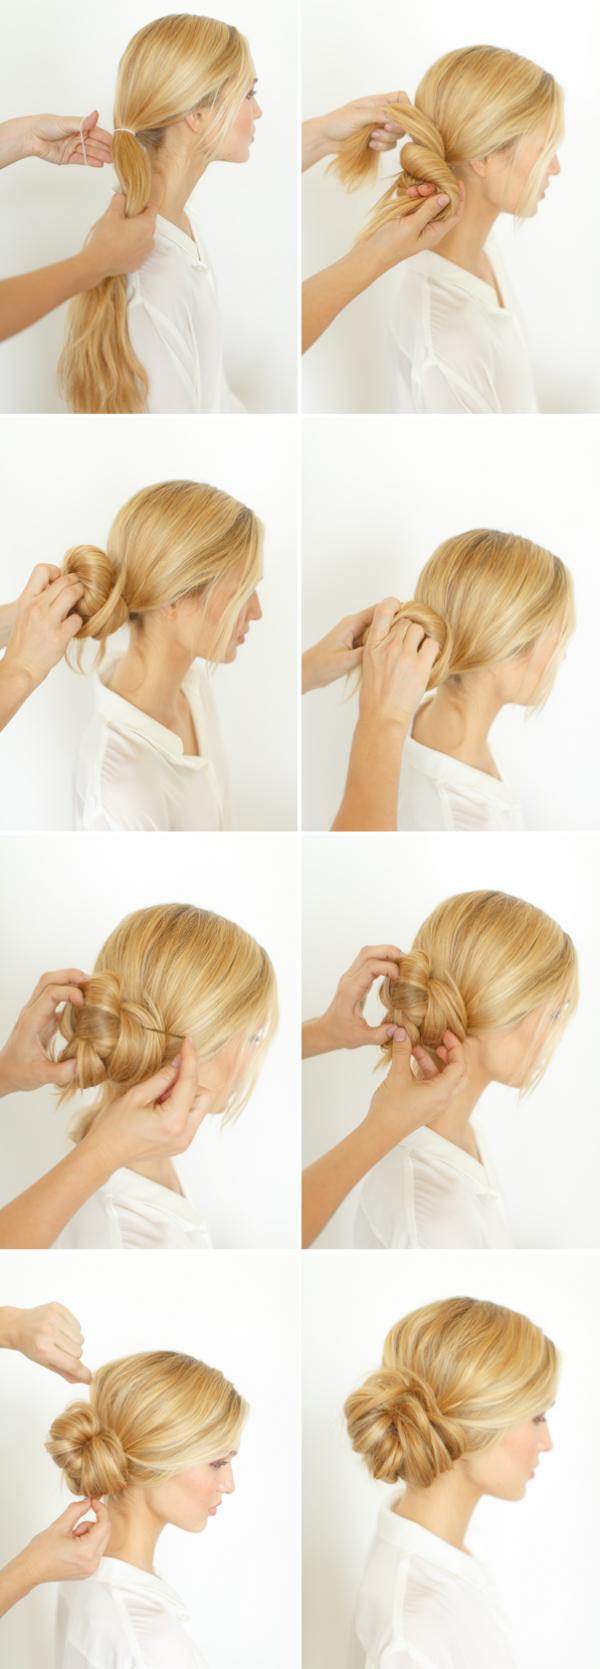 diy knotted bun wedding hairstyle | diy wedding tutorials